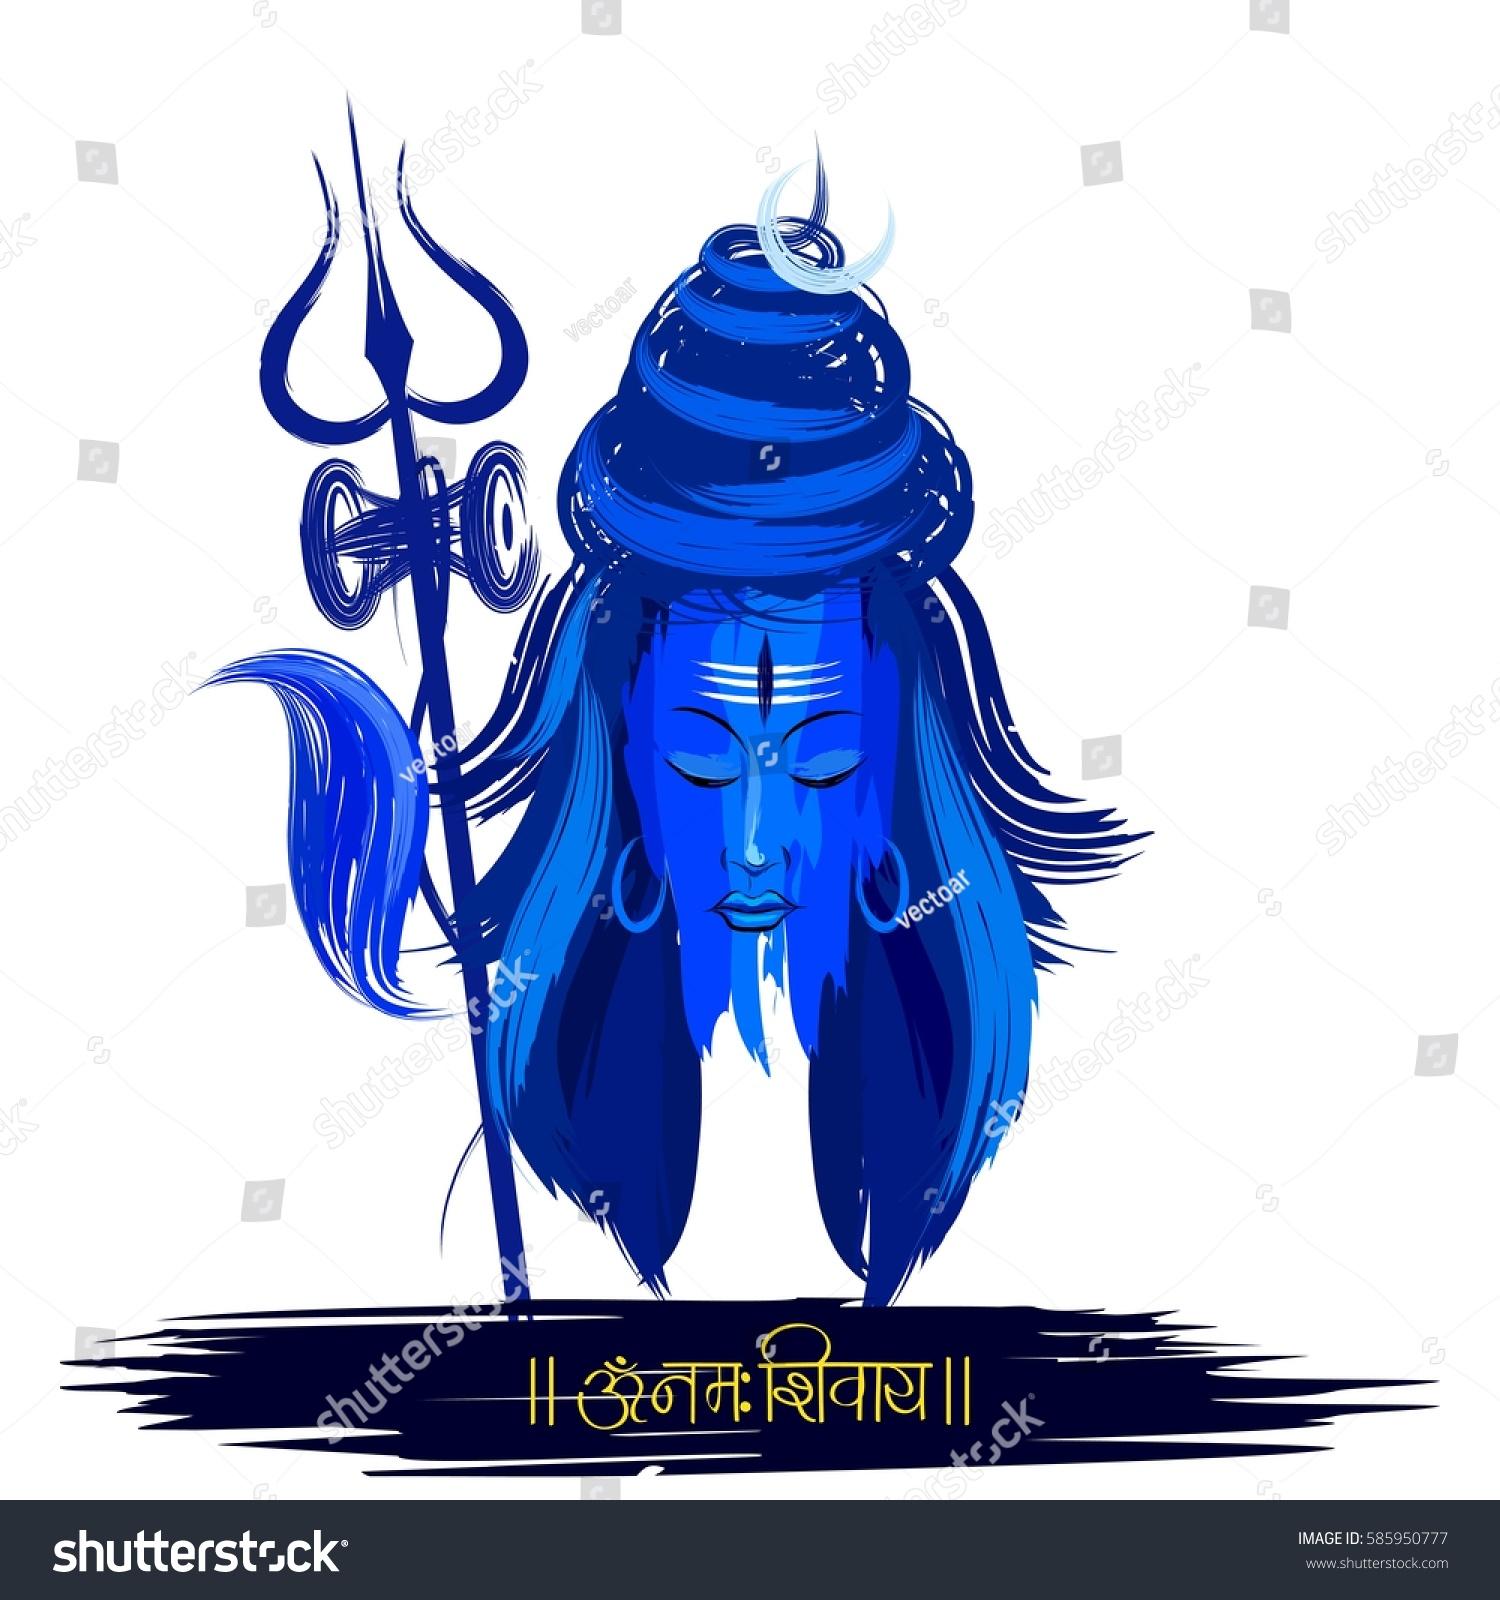 Illustration Lord Shiva Stock Vector (Royalty Free) 585950777